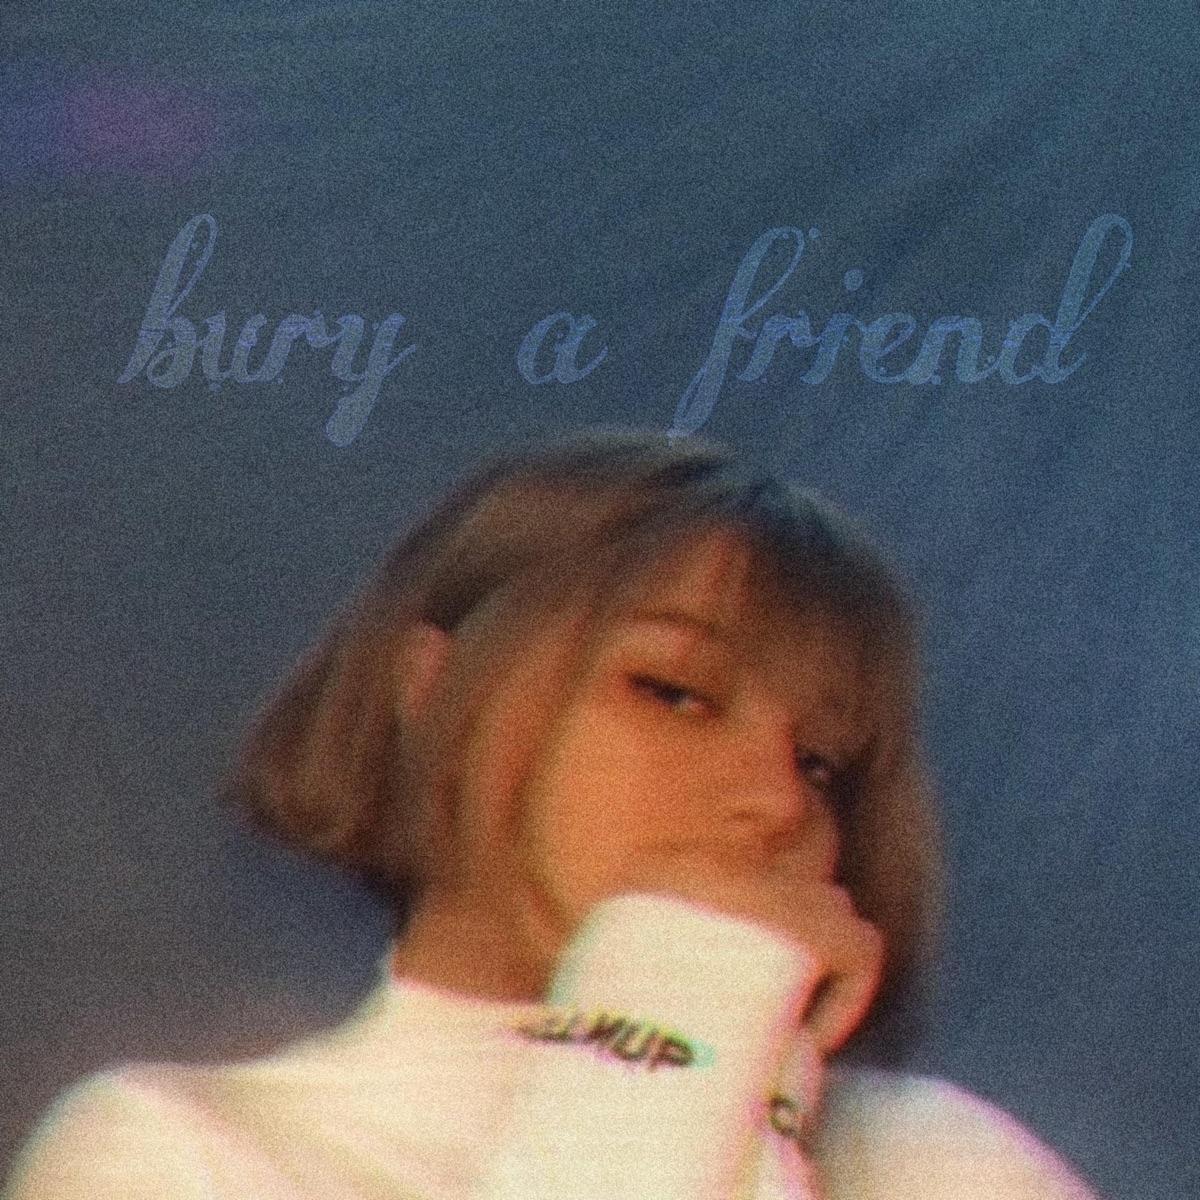 Bury a Friend - Single Kholoud Drif CD cover